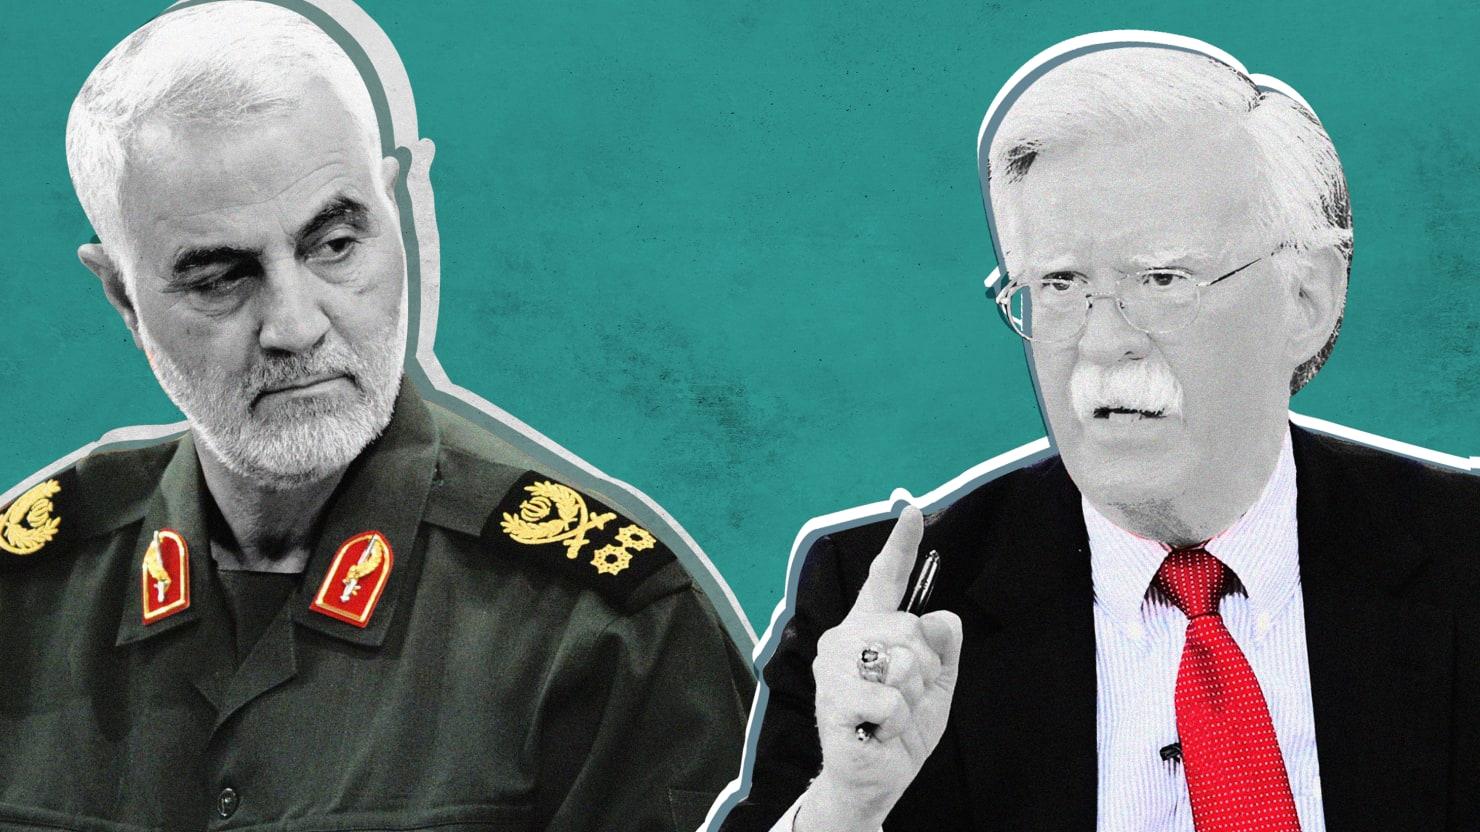 thedailybeast.com - Betsy Woodruff - Trump Admin Moves Fueled Iran's Aggression, U.S. Intel Says